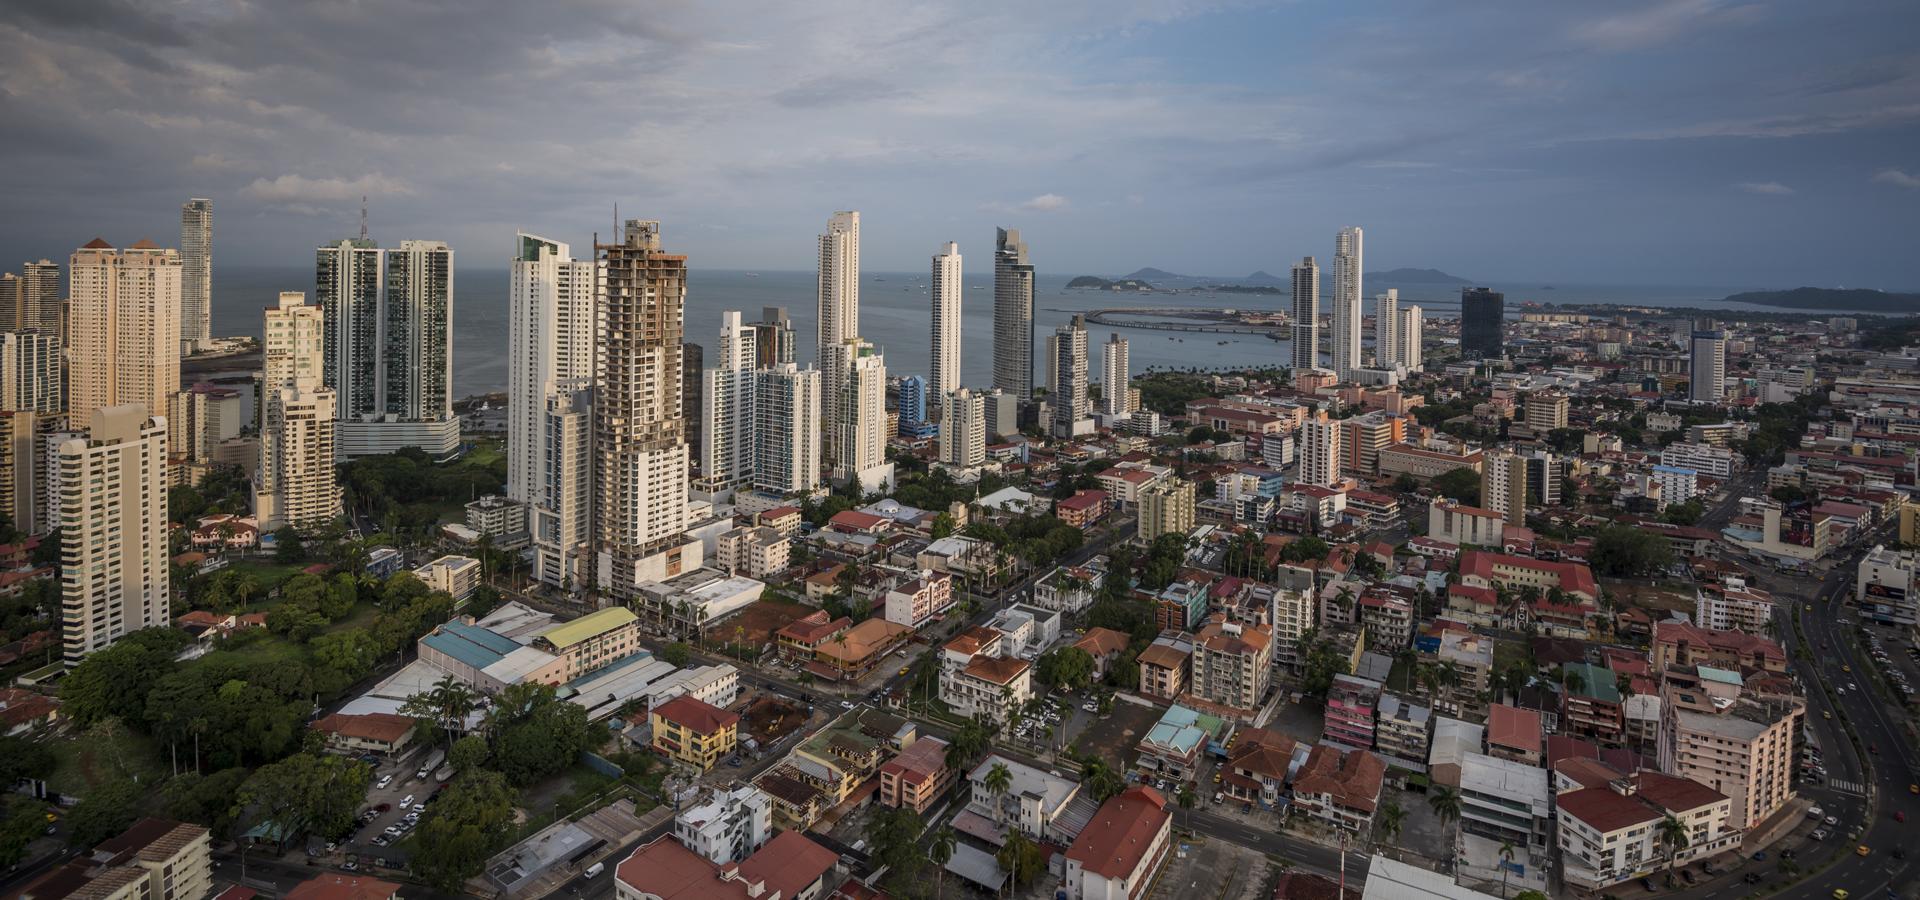 Peer-to-peer advisory in Panama City